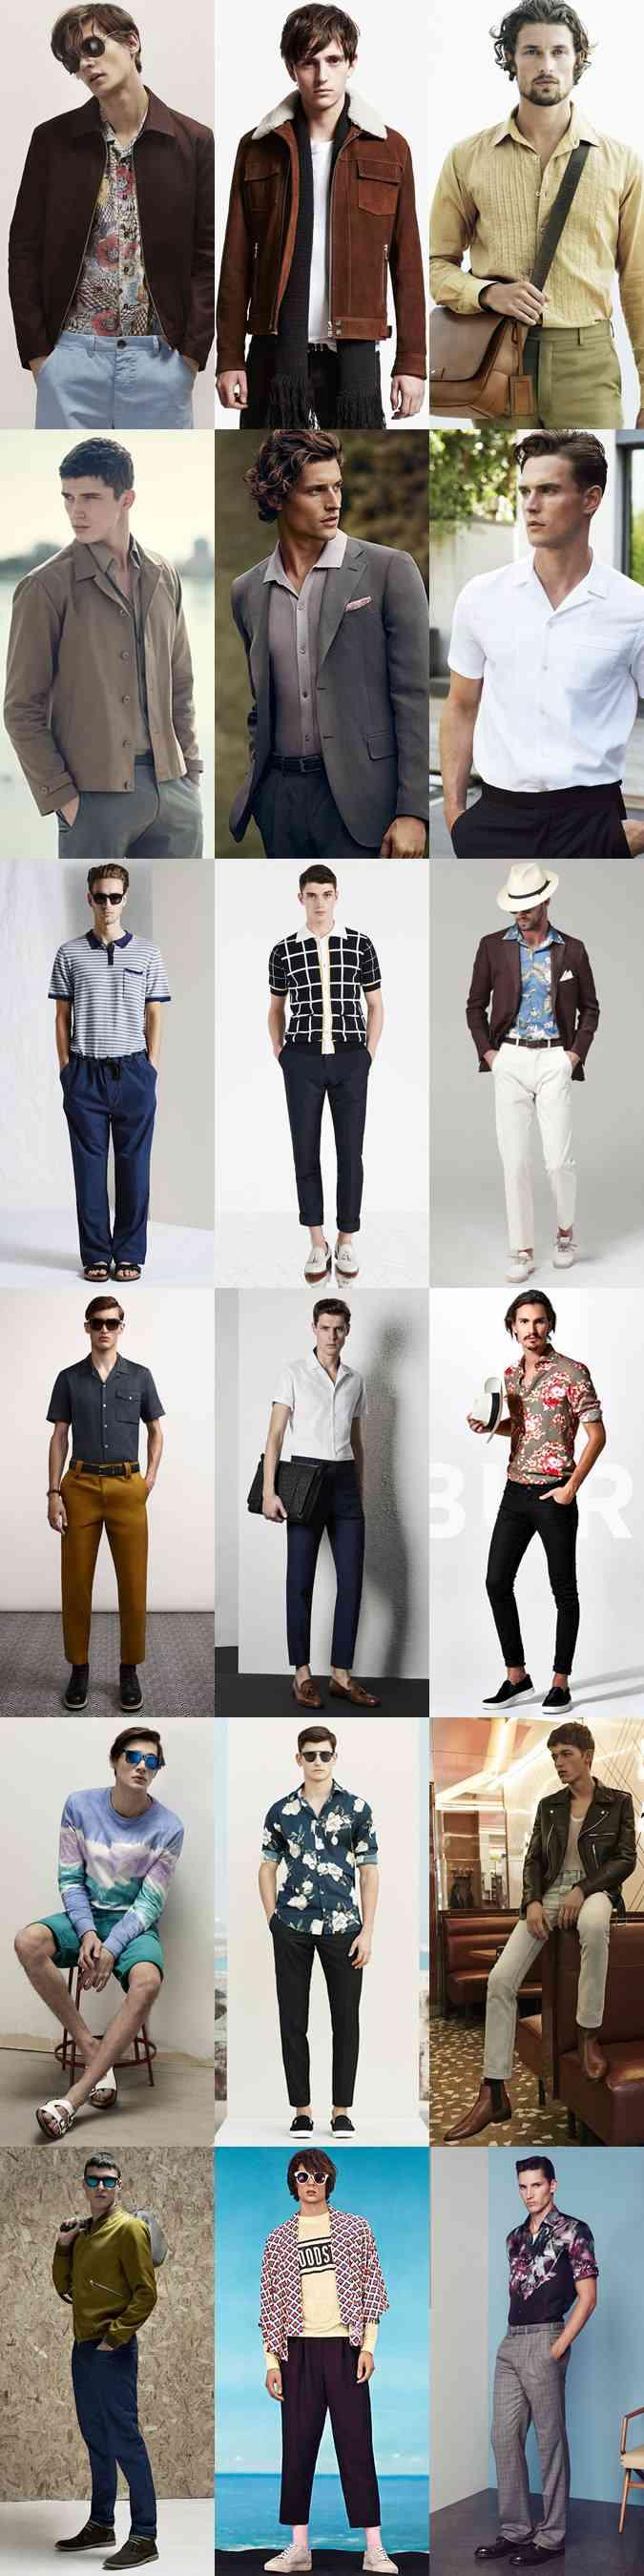 6 tinute anii 70 la moda